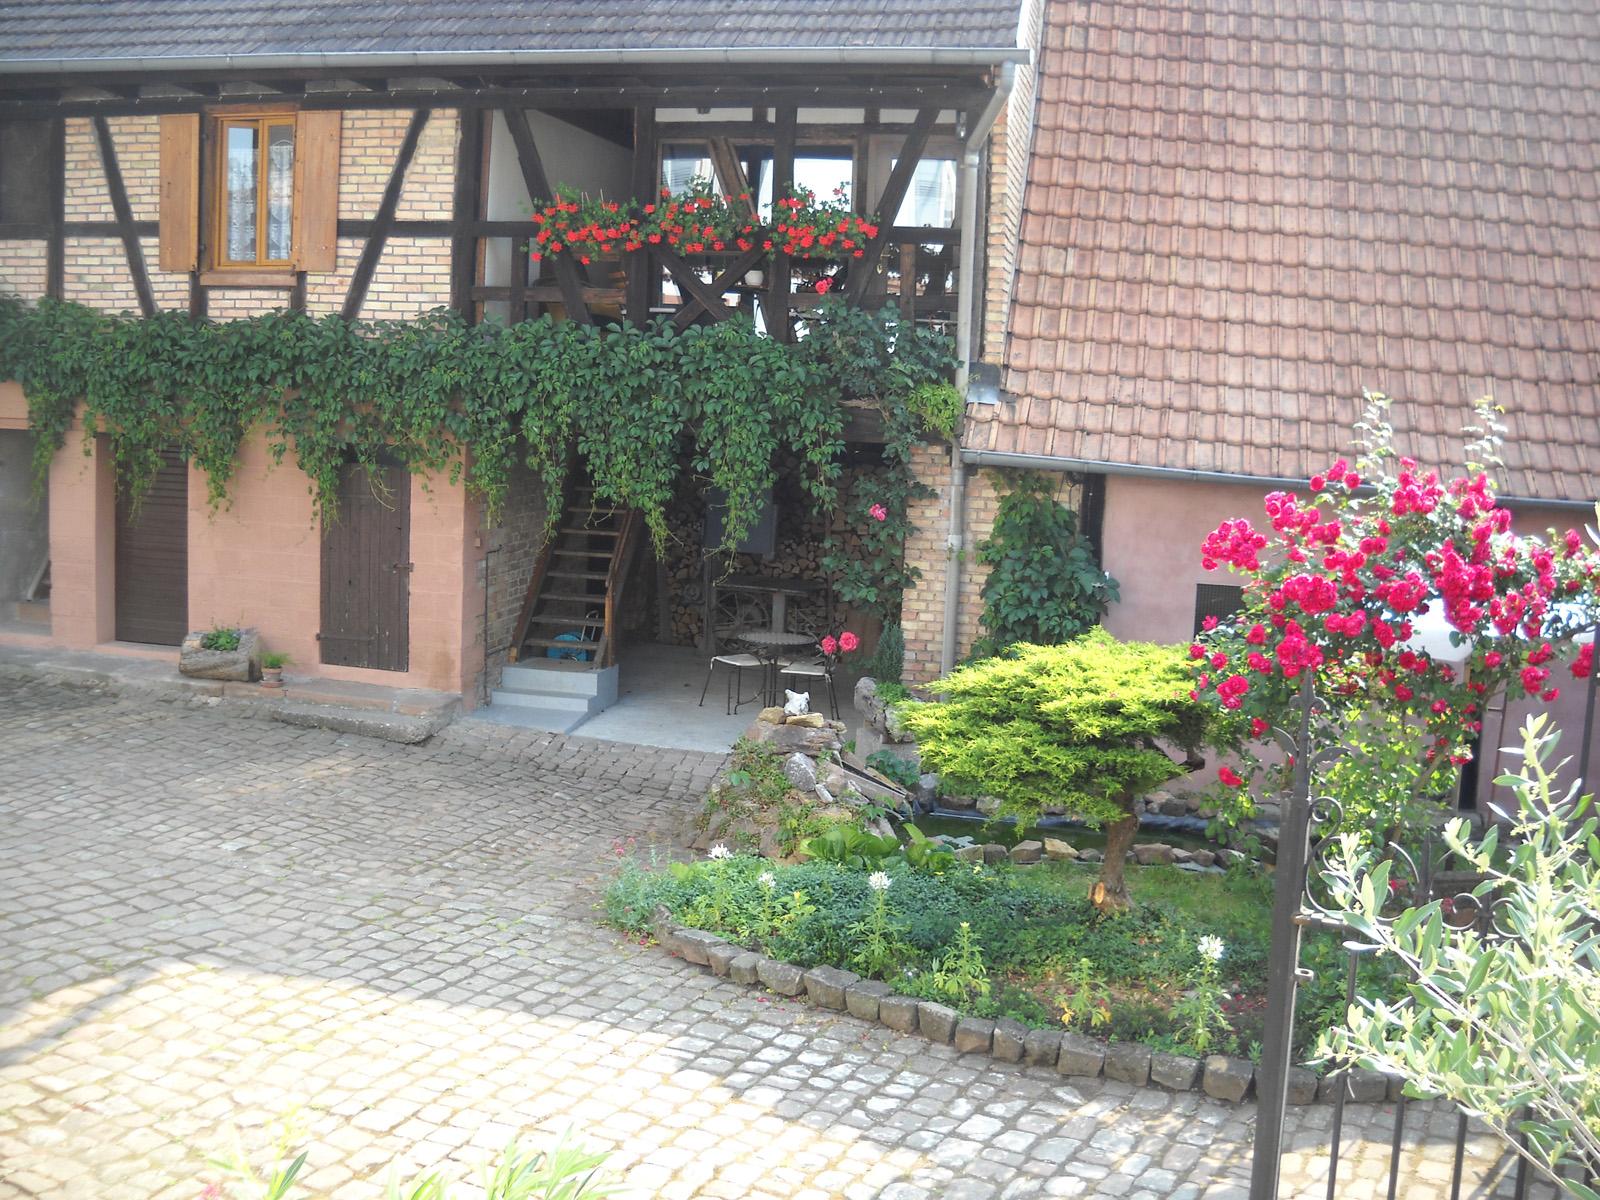 Meublé de M. Leininger, Mietesheim, Alsace